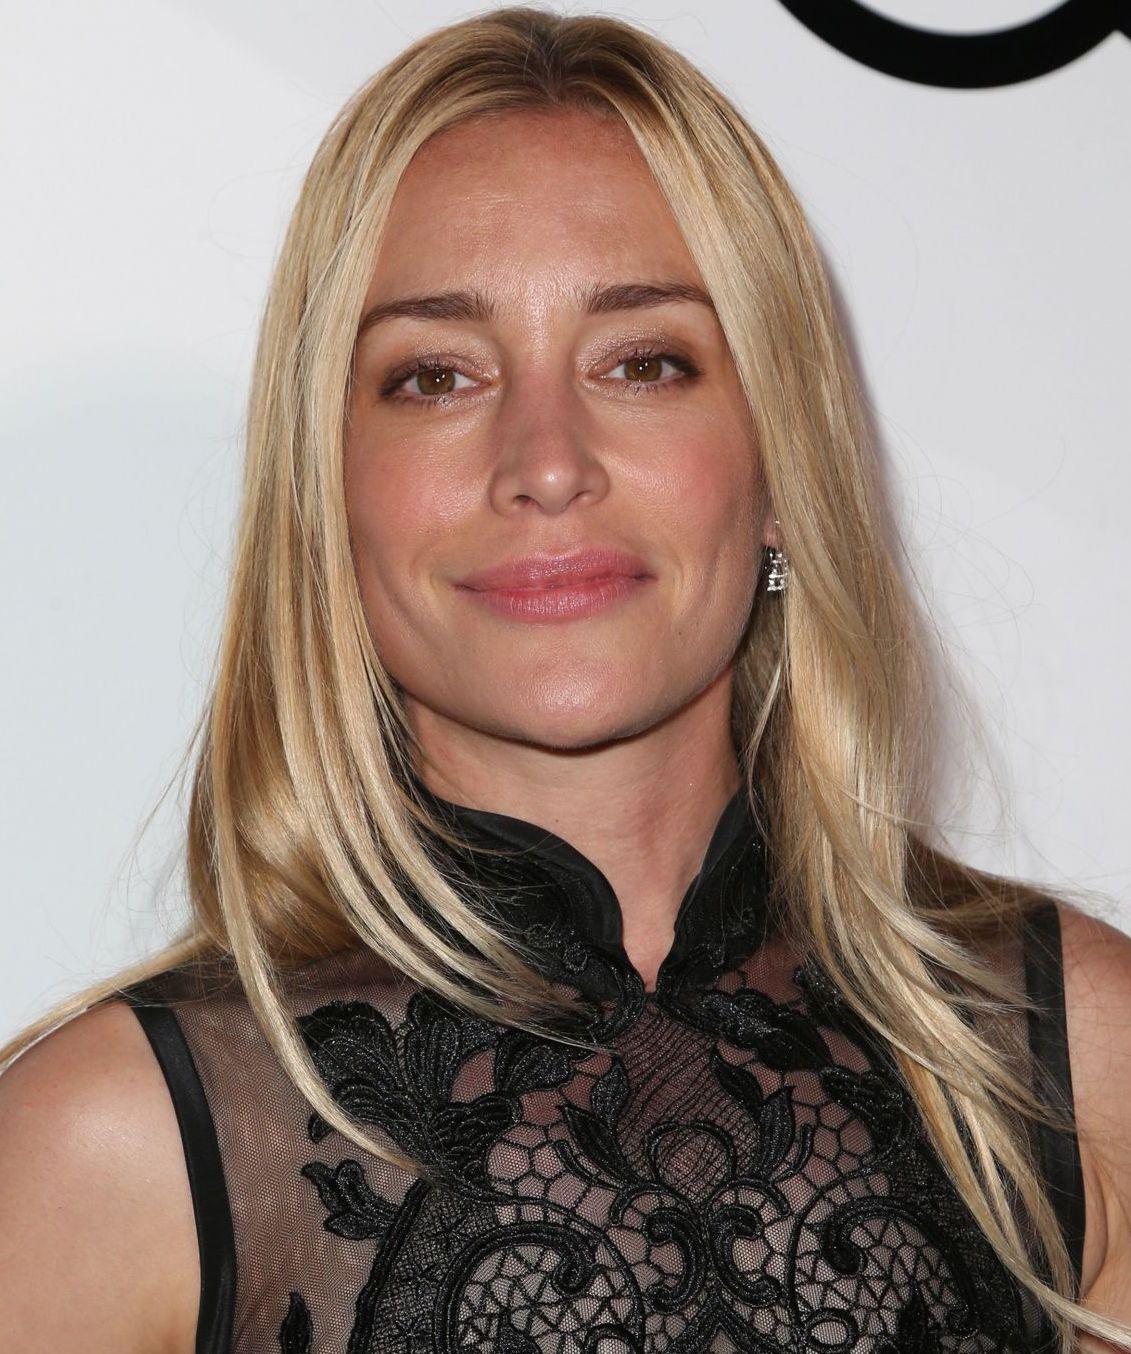 Ashley Johnson born August 9, 1983 (age 35),Ruth Cohen Hot fotos Linda Hooks,Rachael Bella